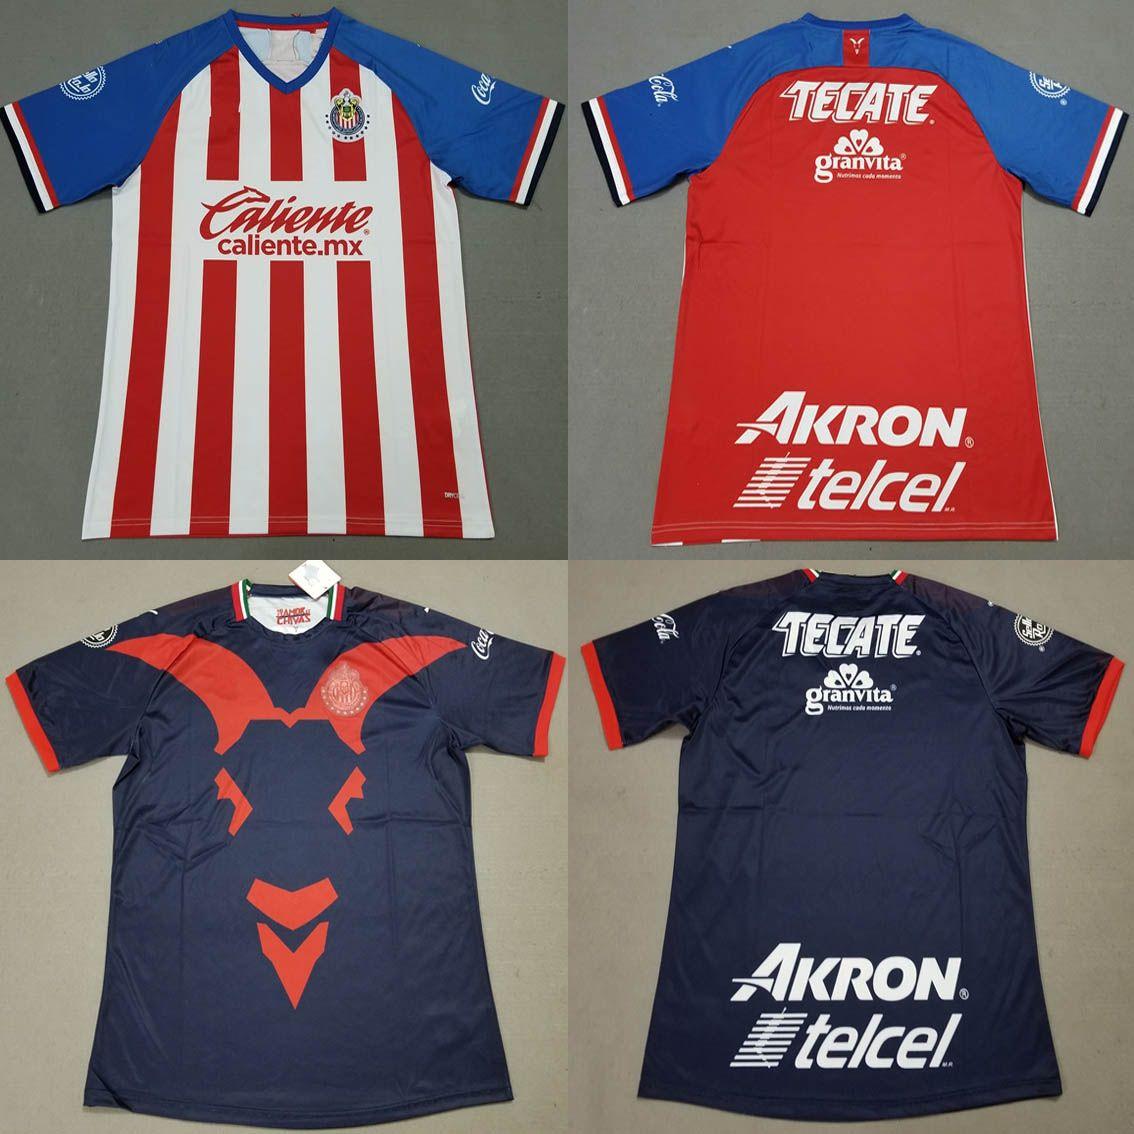 new arrivals 5f461 21293 19 20 Chivas Soccer Jersey A.PULIDO LOPEZ A.ZALDIVAR VAZQUEZ Football  Shirts 2019/20 Chivas Guadalajara Home Away Sports Tops